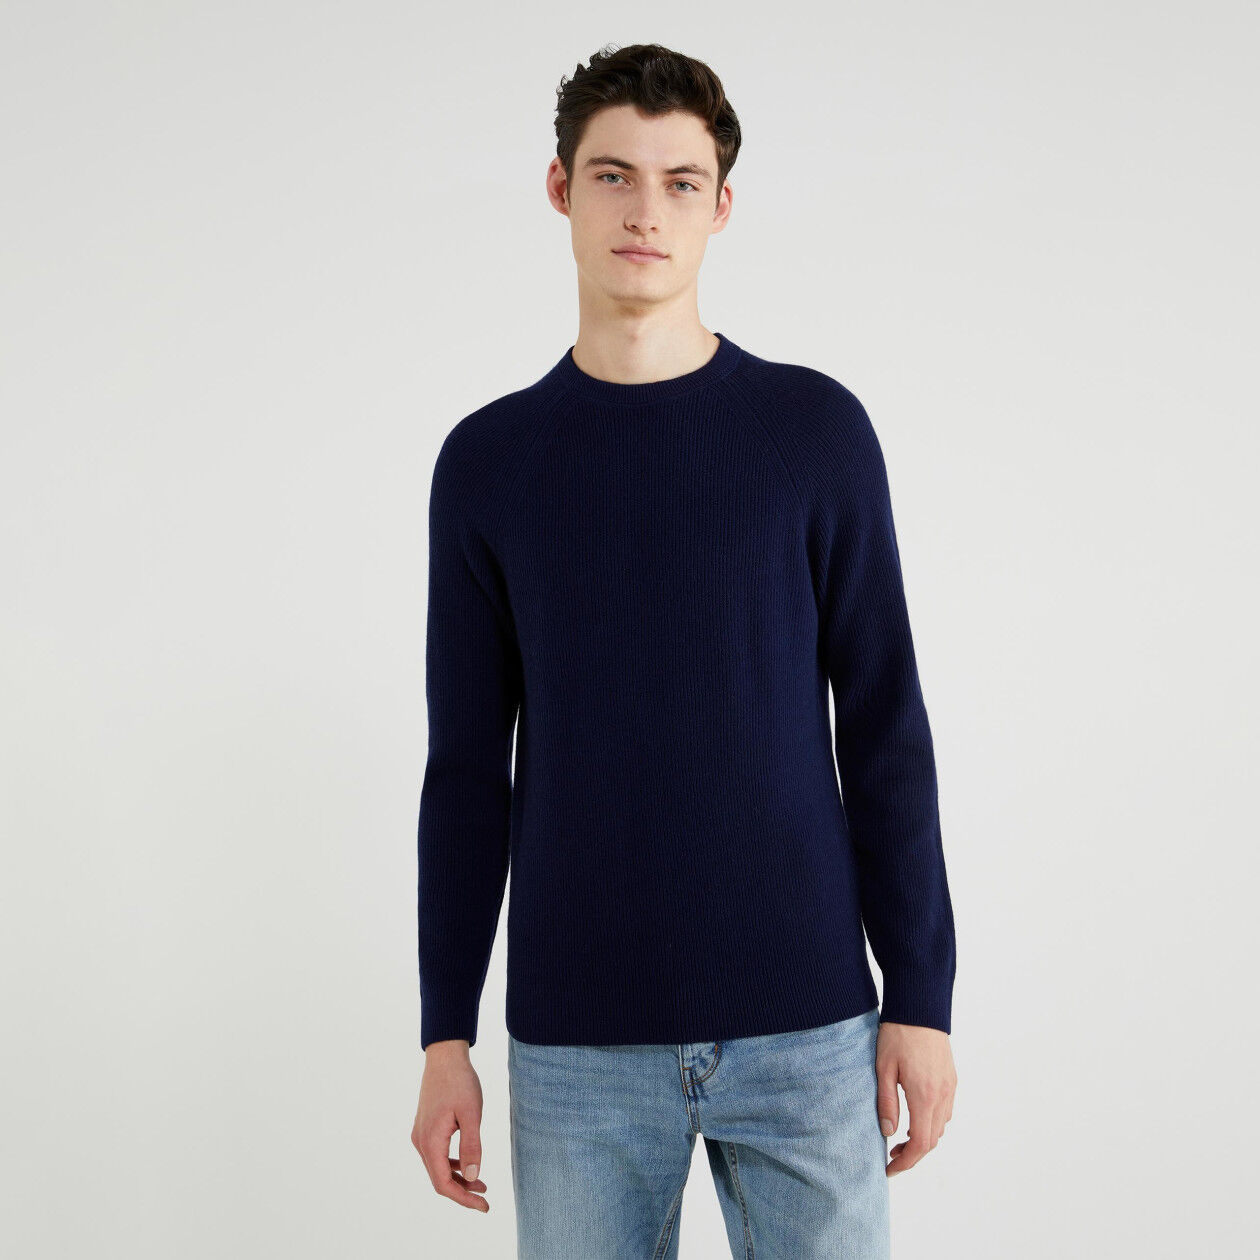 Jersey de lana y cachemir